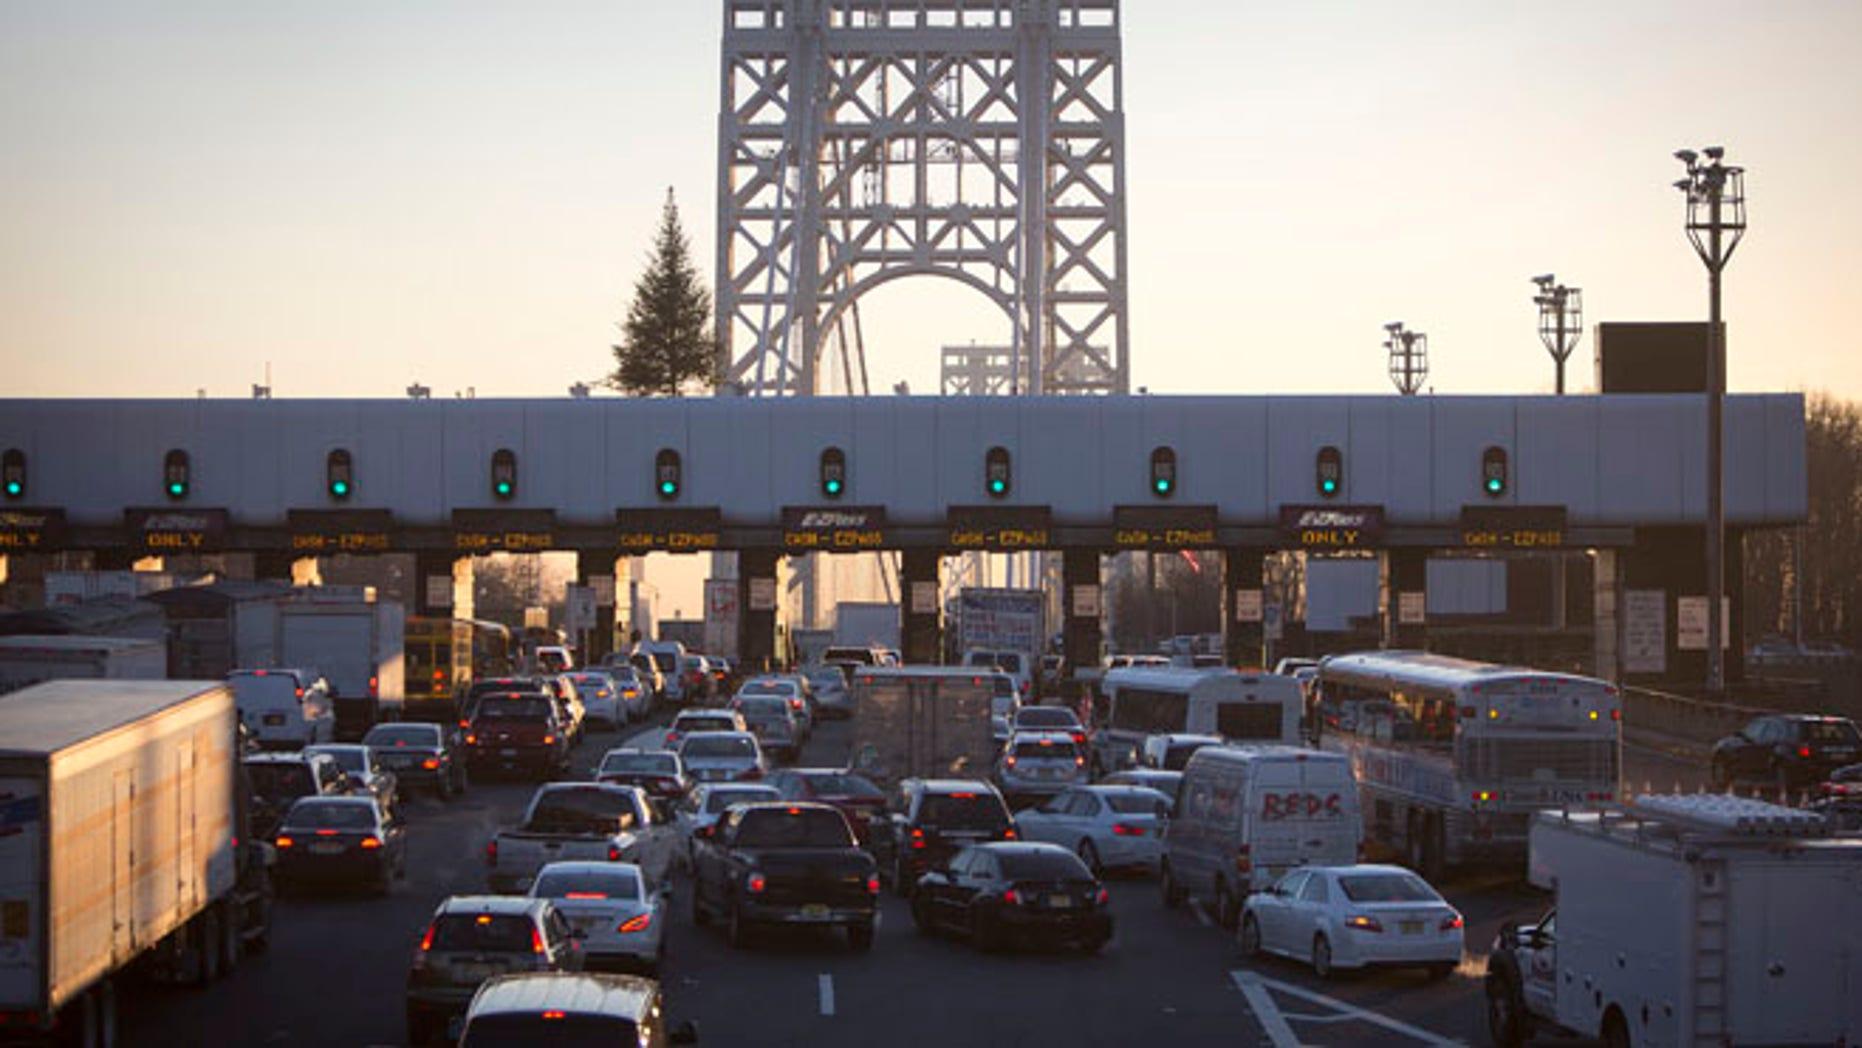 The George Washington Bridge toll booths.